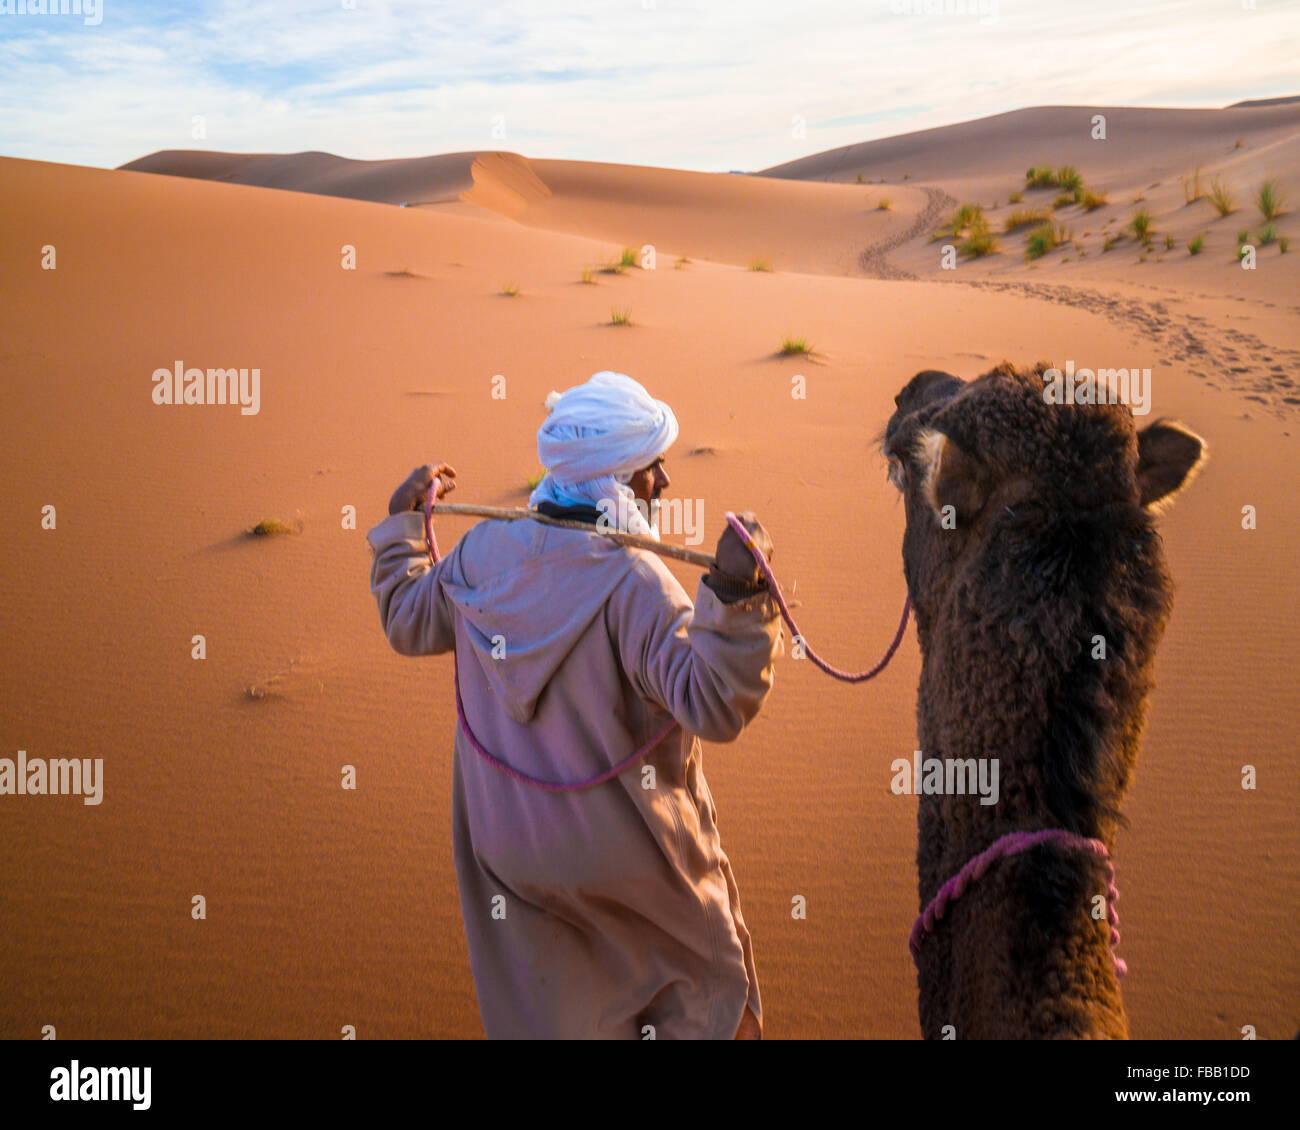 Premier homme camel, Erg Chegaga Maroc Photo Stock